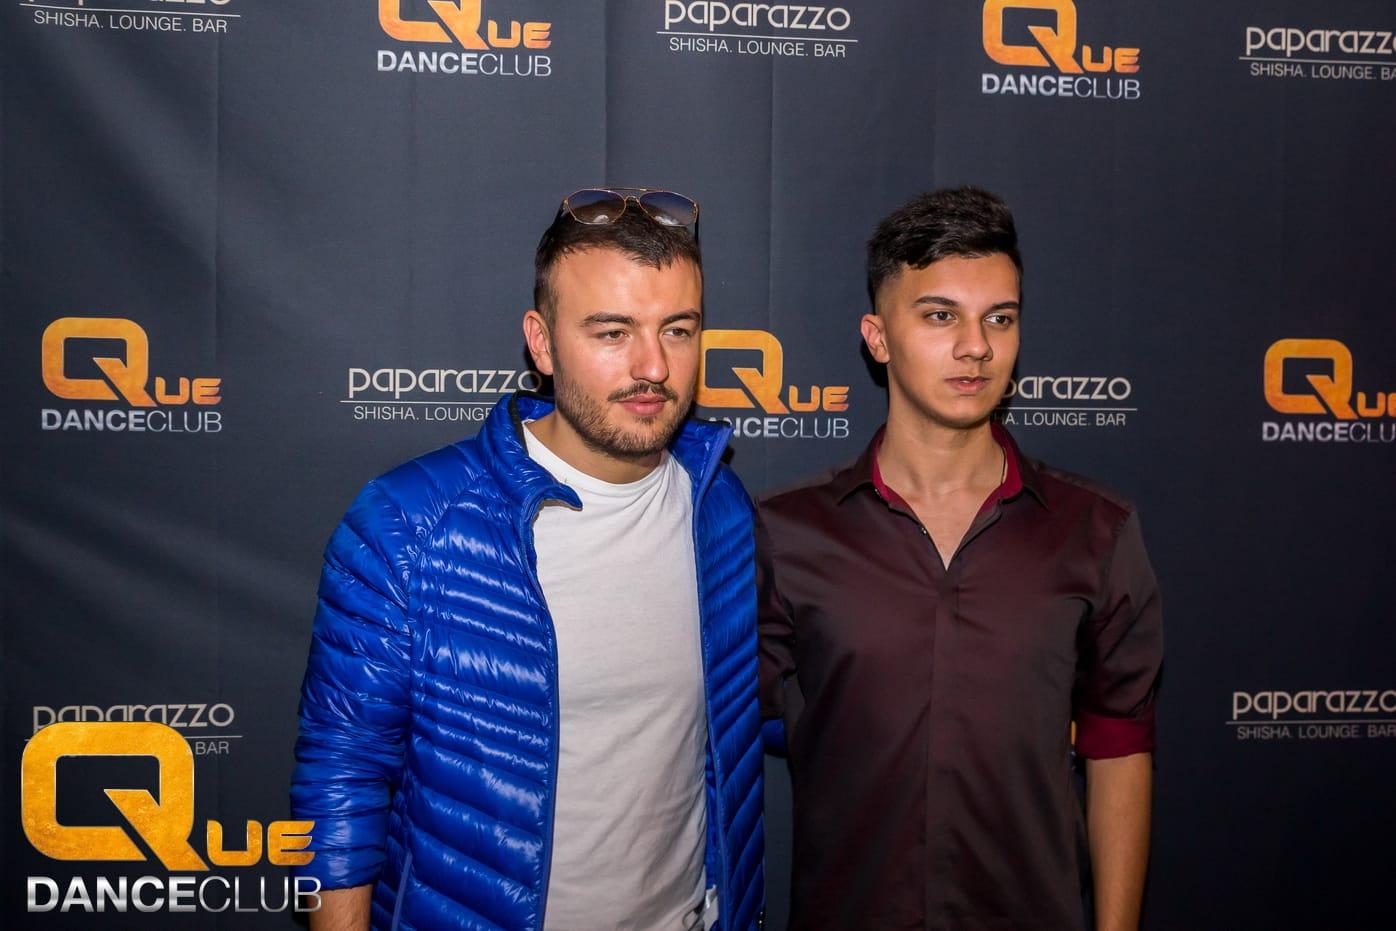 2018_12_08_Que_Danceclub_Paparazzo_Night_Ardian_Bujupi_Live_Nightlife_Scene_Timo_077